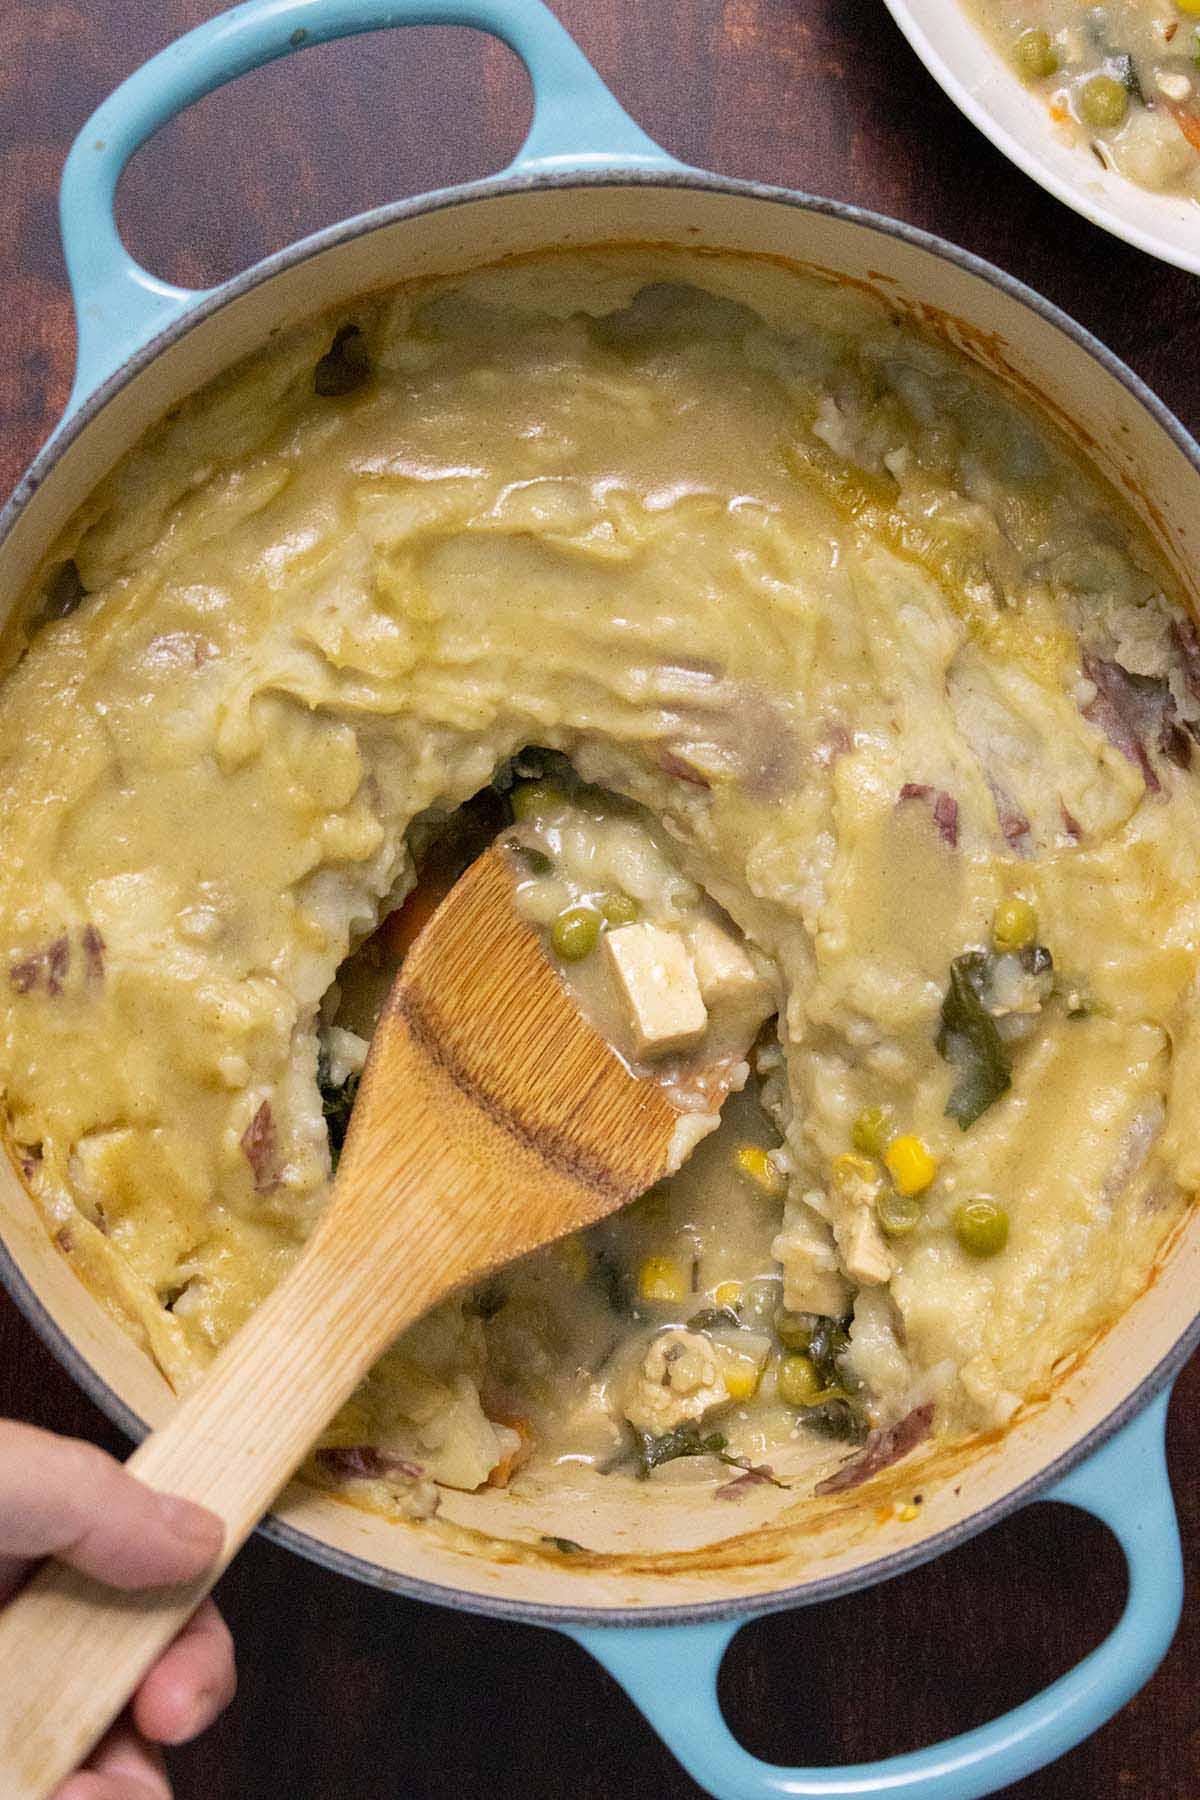 Dutch oven full of vegan shepherd's pie with tofu on the serving spoon